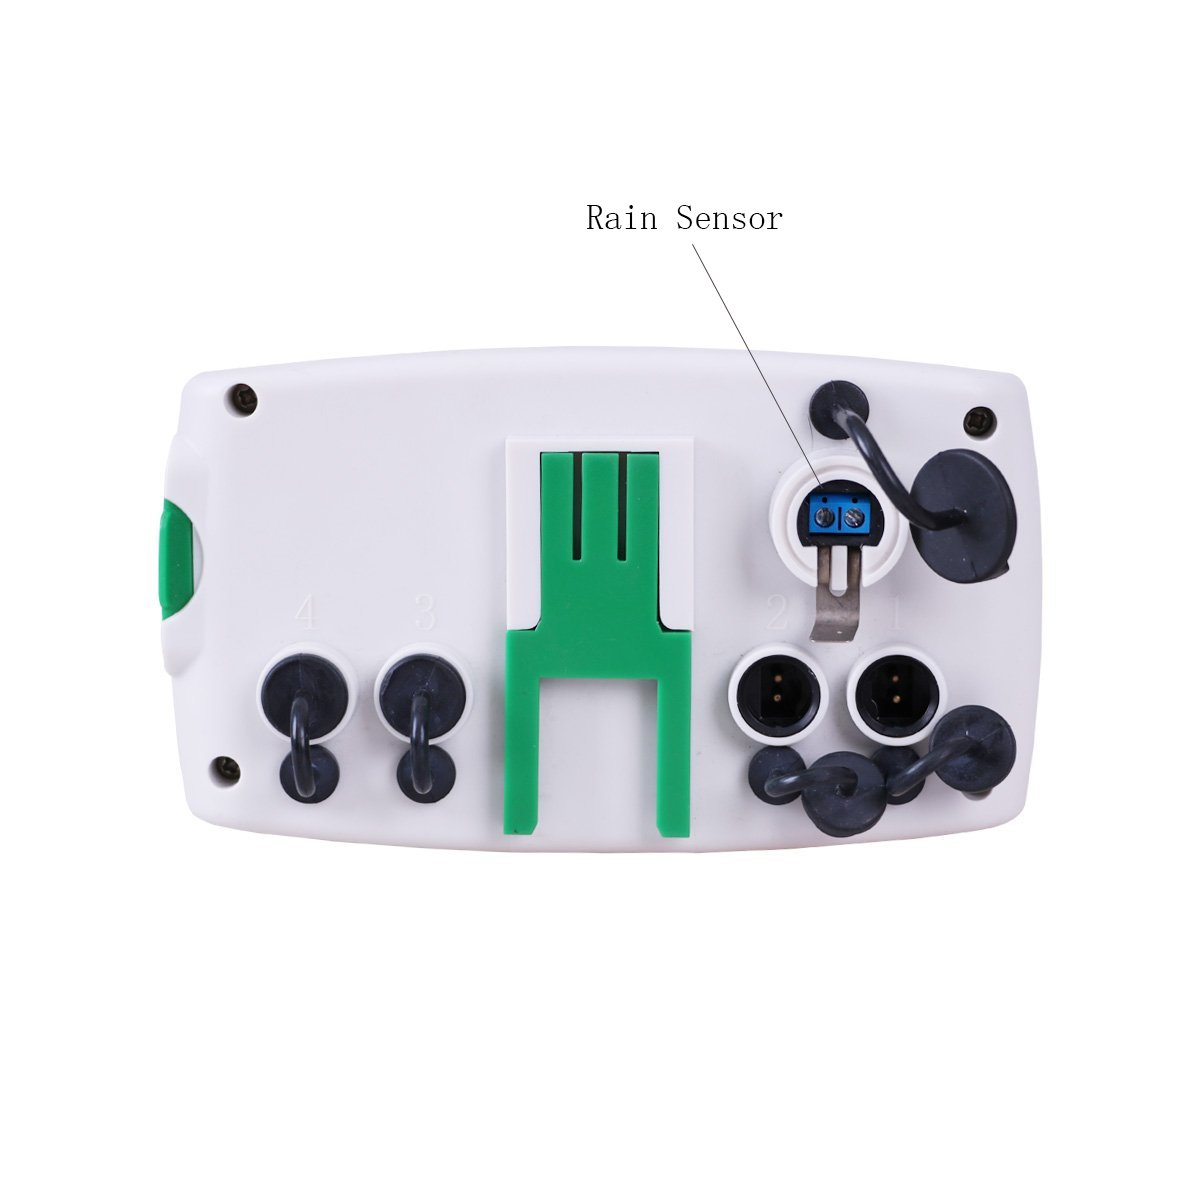 Aqualin Programador de riego 4 Zonas Controlador de Temporizador ...